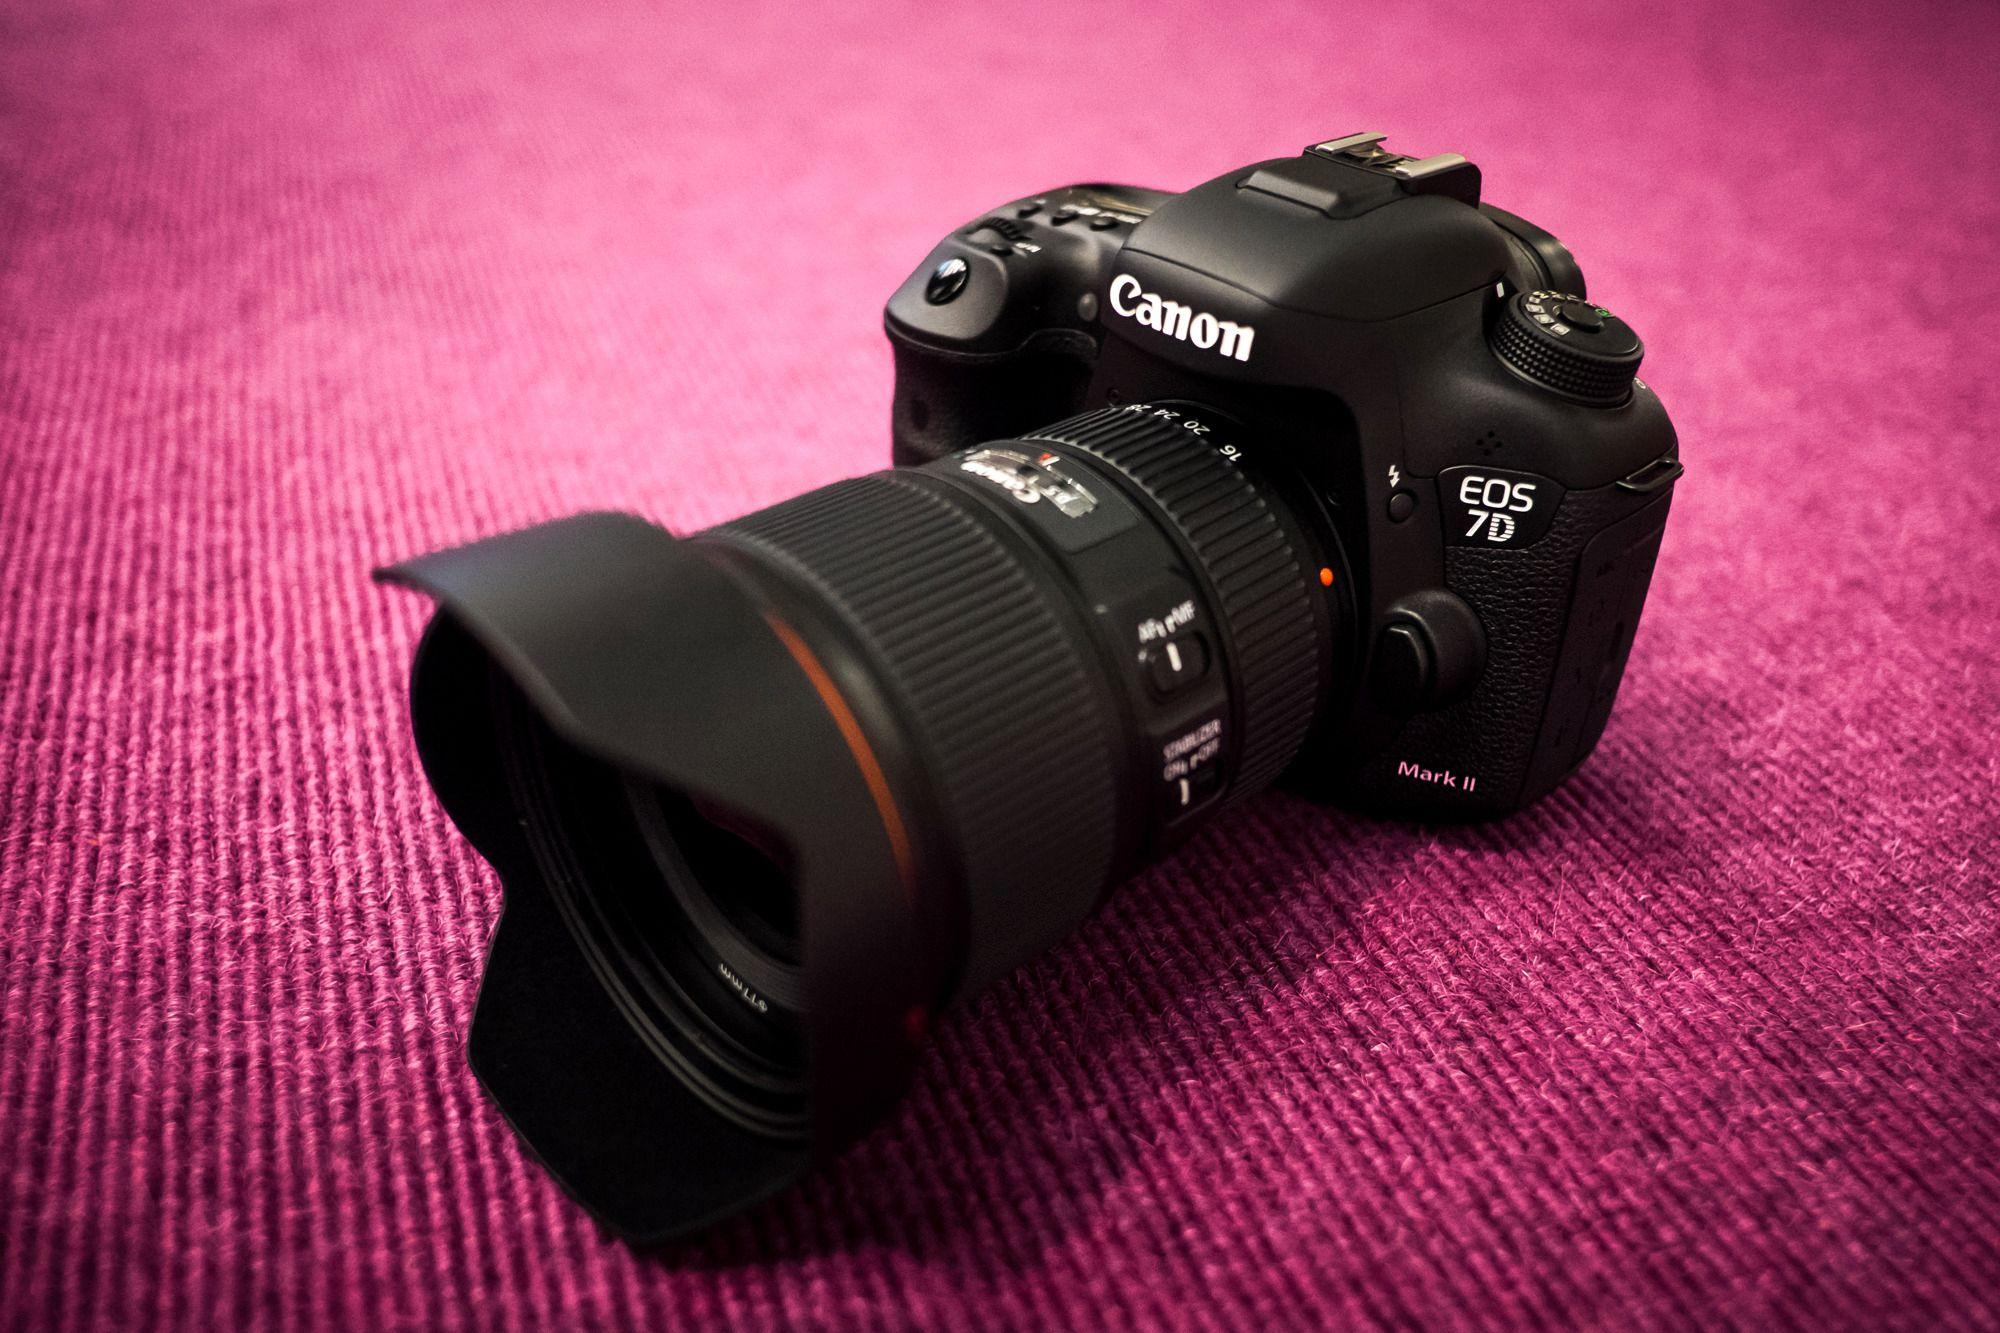 Canon EOS 7D Mark II med den nye Canon EF 16-35mm f/4.0 L IS USM. (Foto: Johannes Granseth)